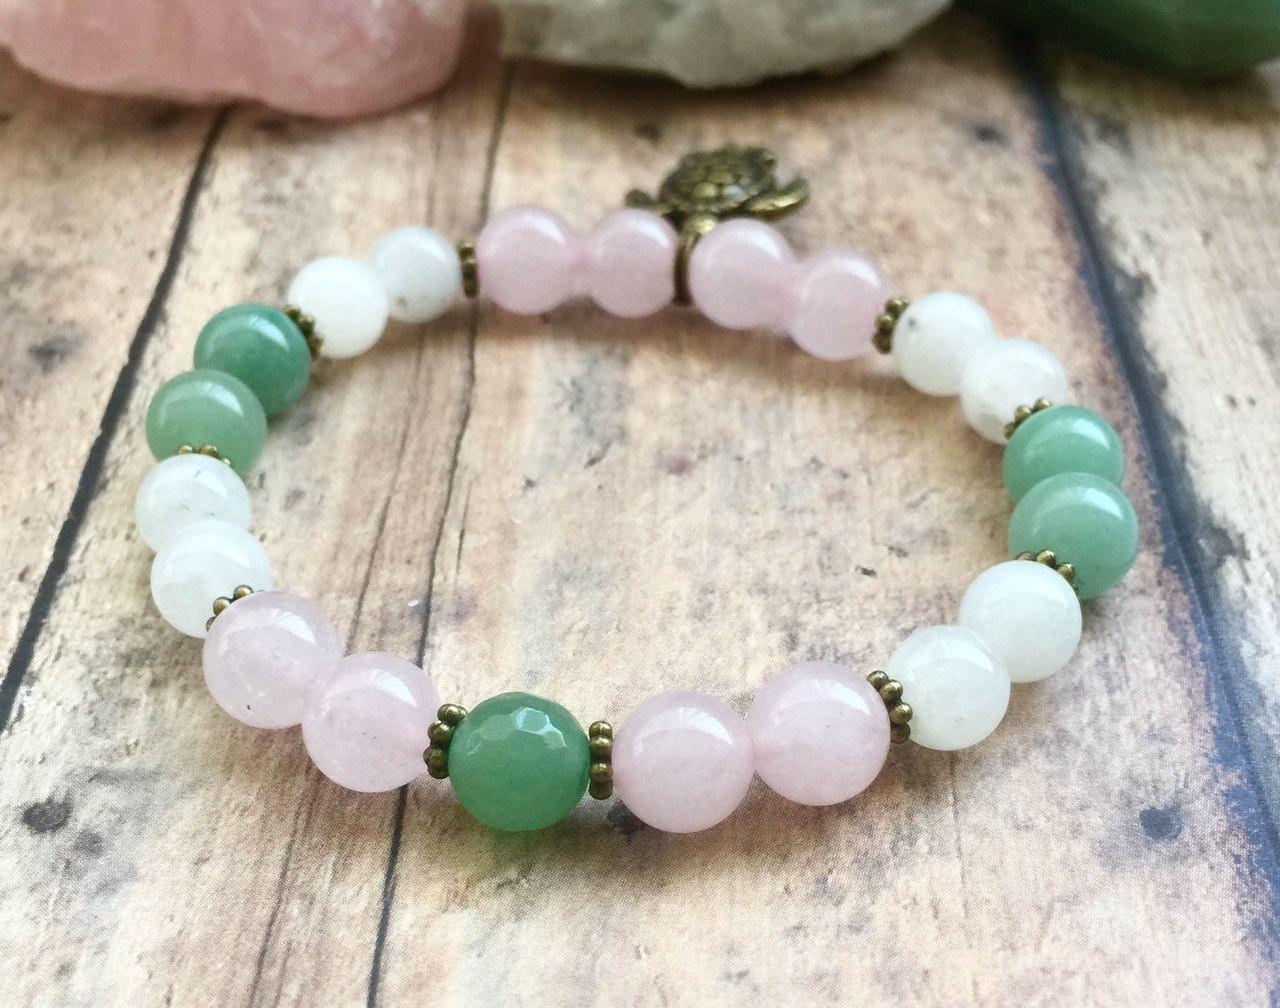 Fertility Bracelet Moonstone Rose Quartz Aventurine Turtle Symbolism